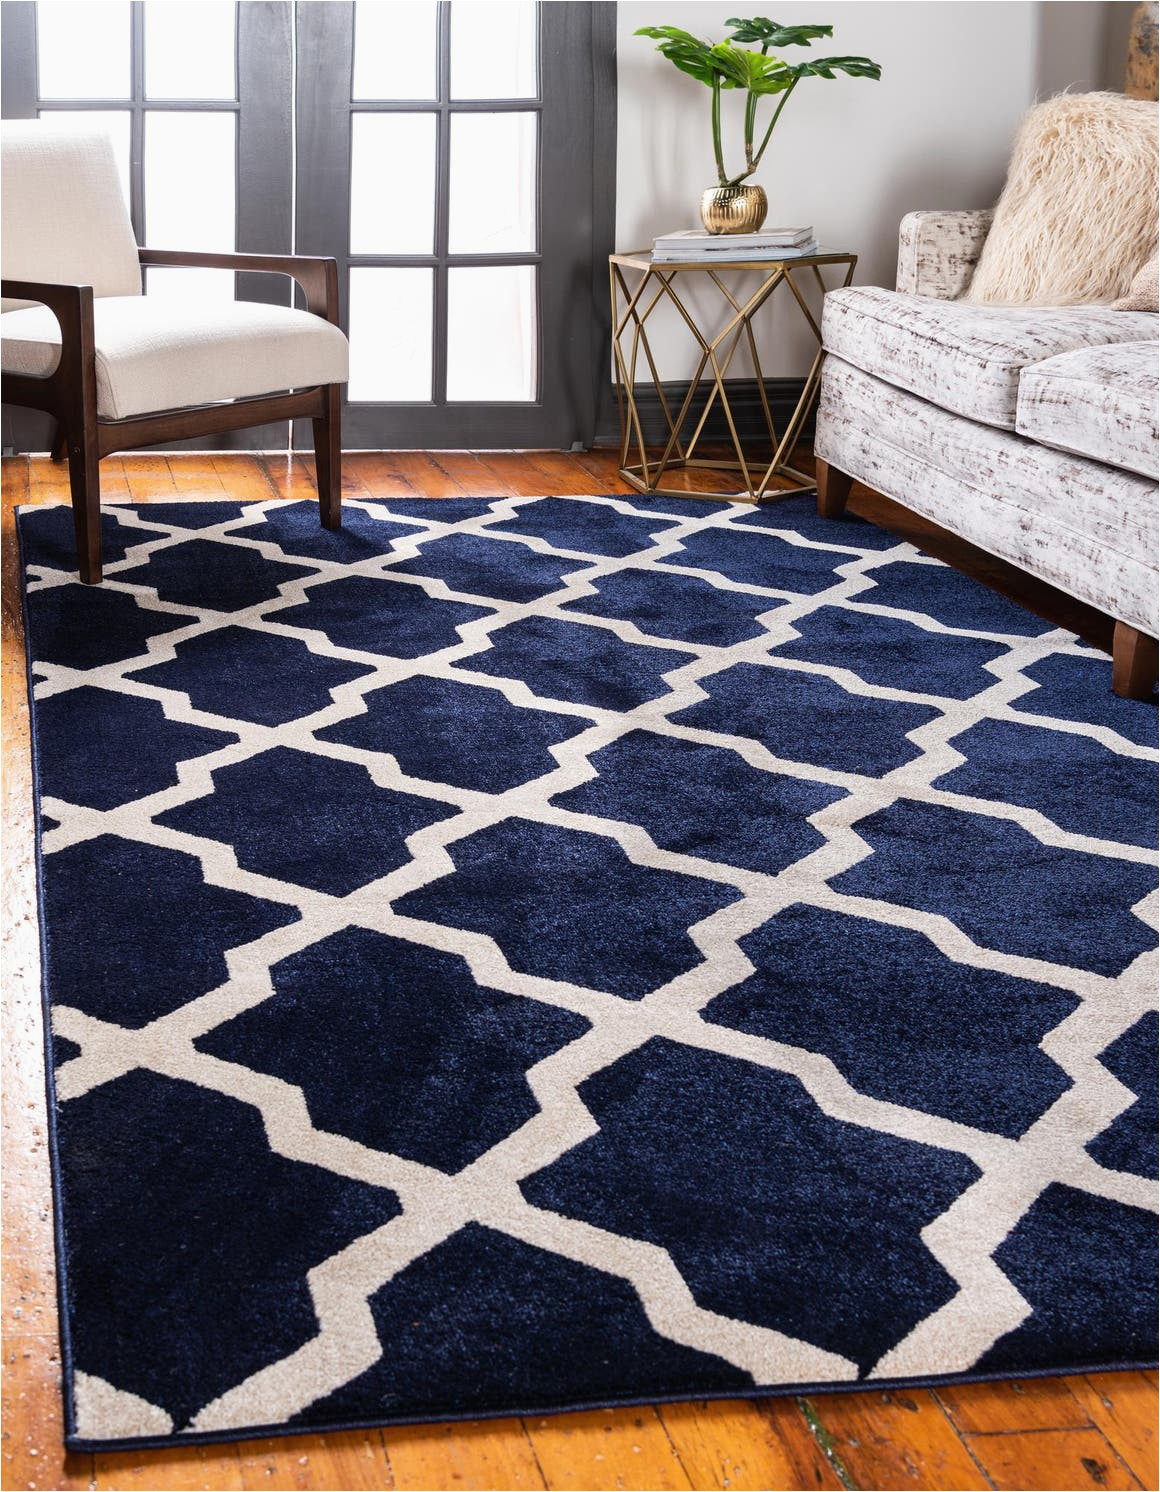 navy blue 5x8 lattice area rug